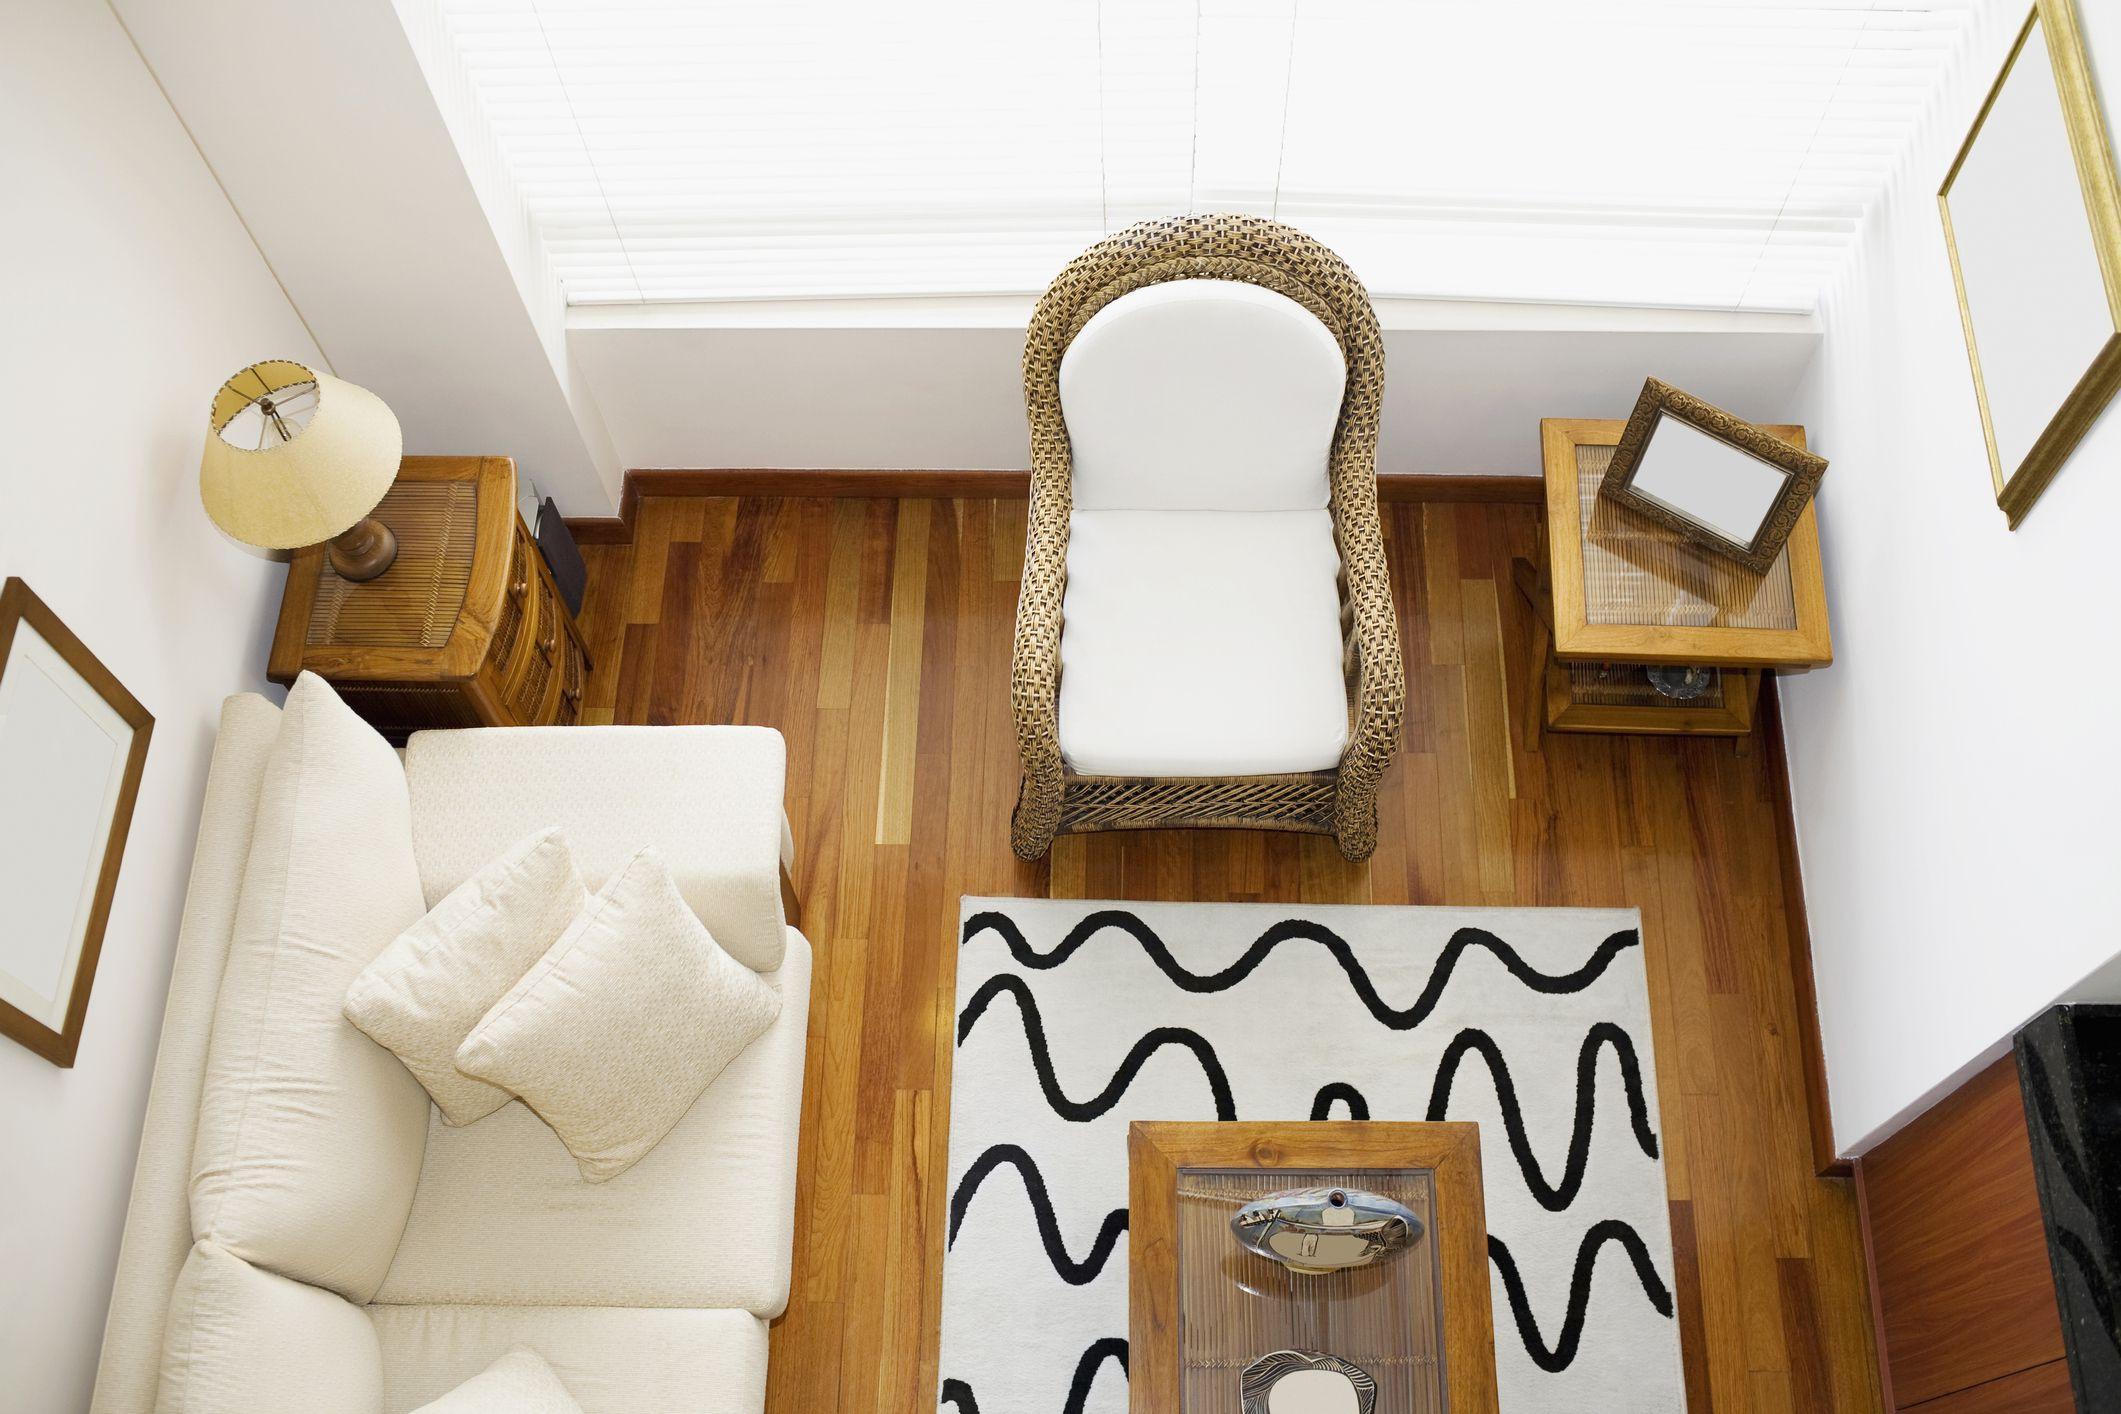 replacing carpet with hardwood floors cost of stop putting hardwood floors in every room inside 1480712606 hardwood floor rug